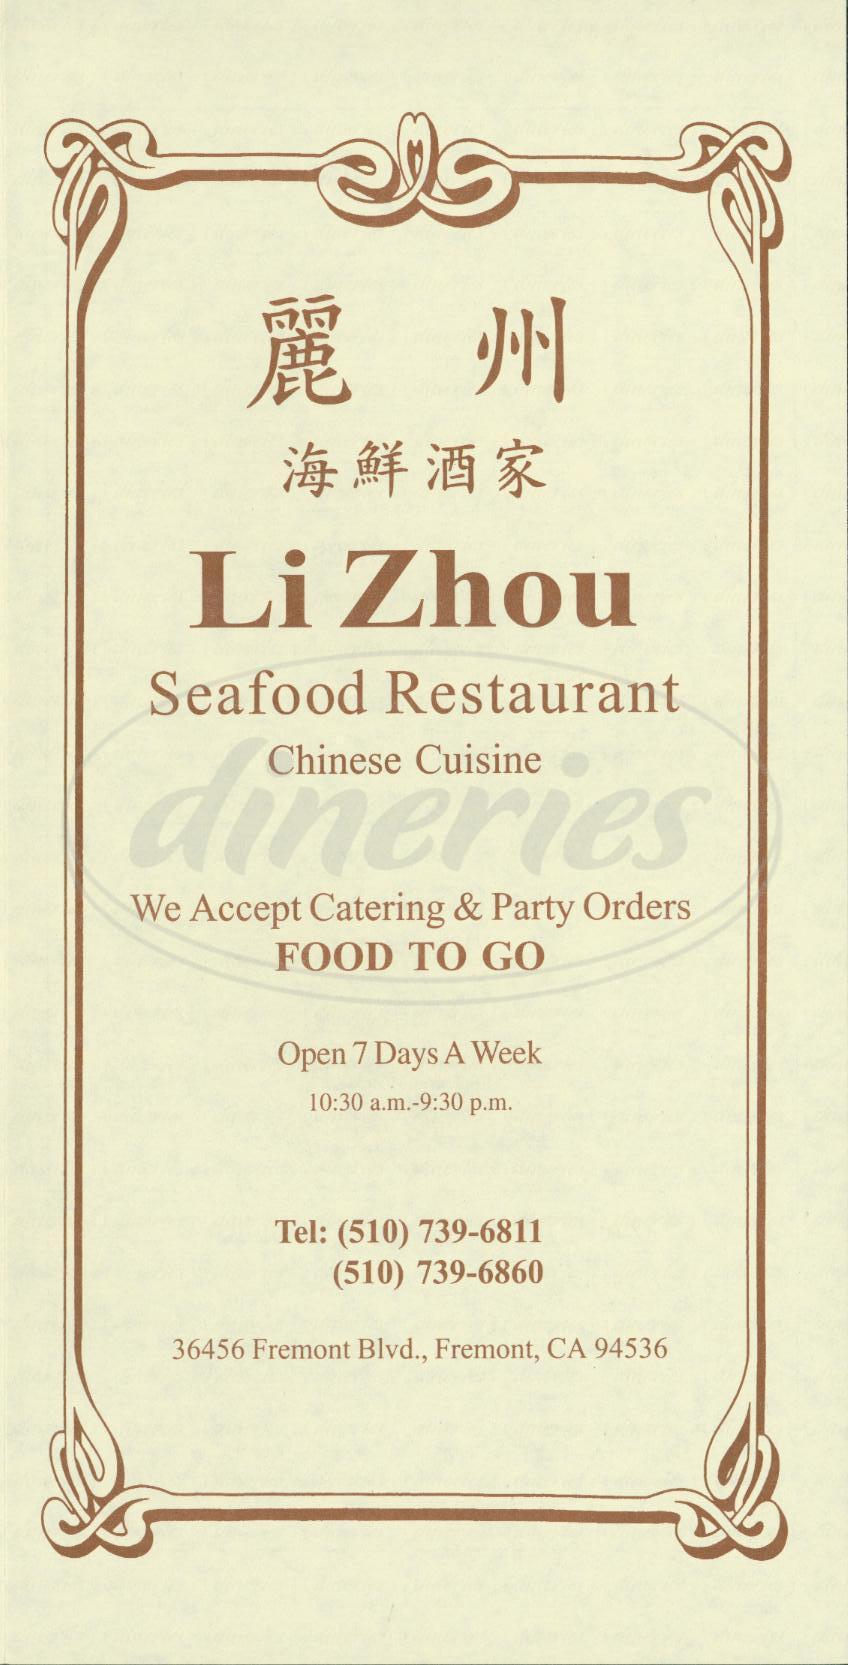 Li Zhou Seafood Restaurant Menu Fremont Dineries